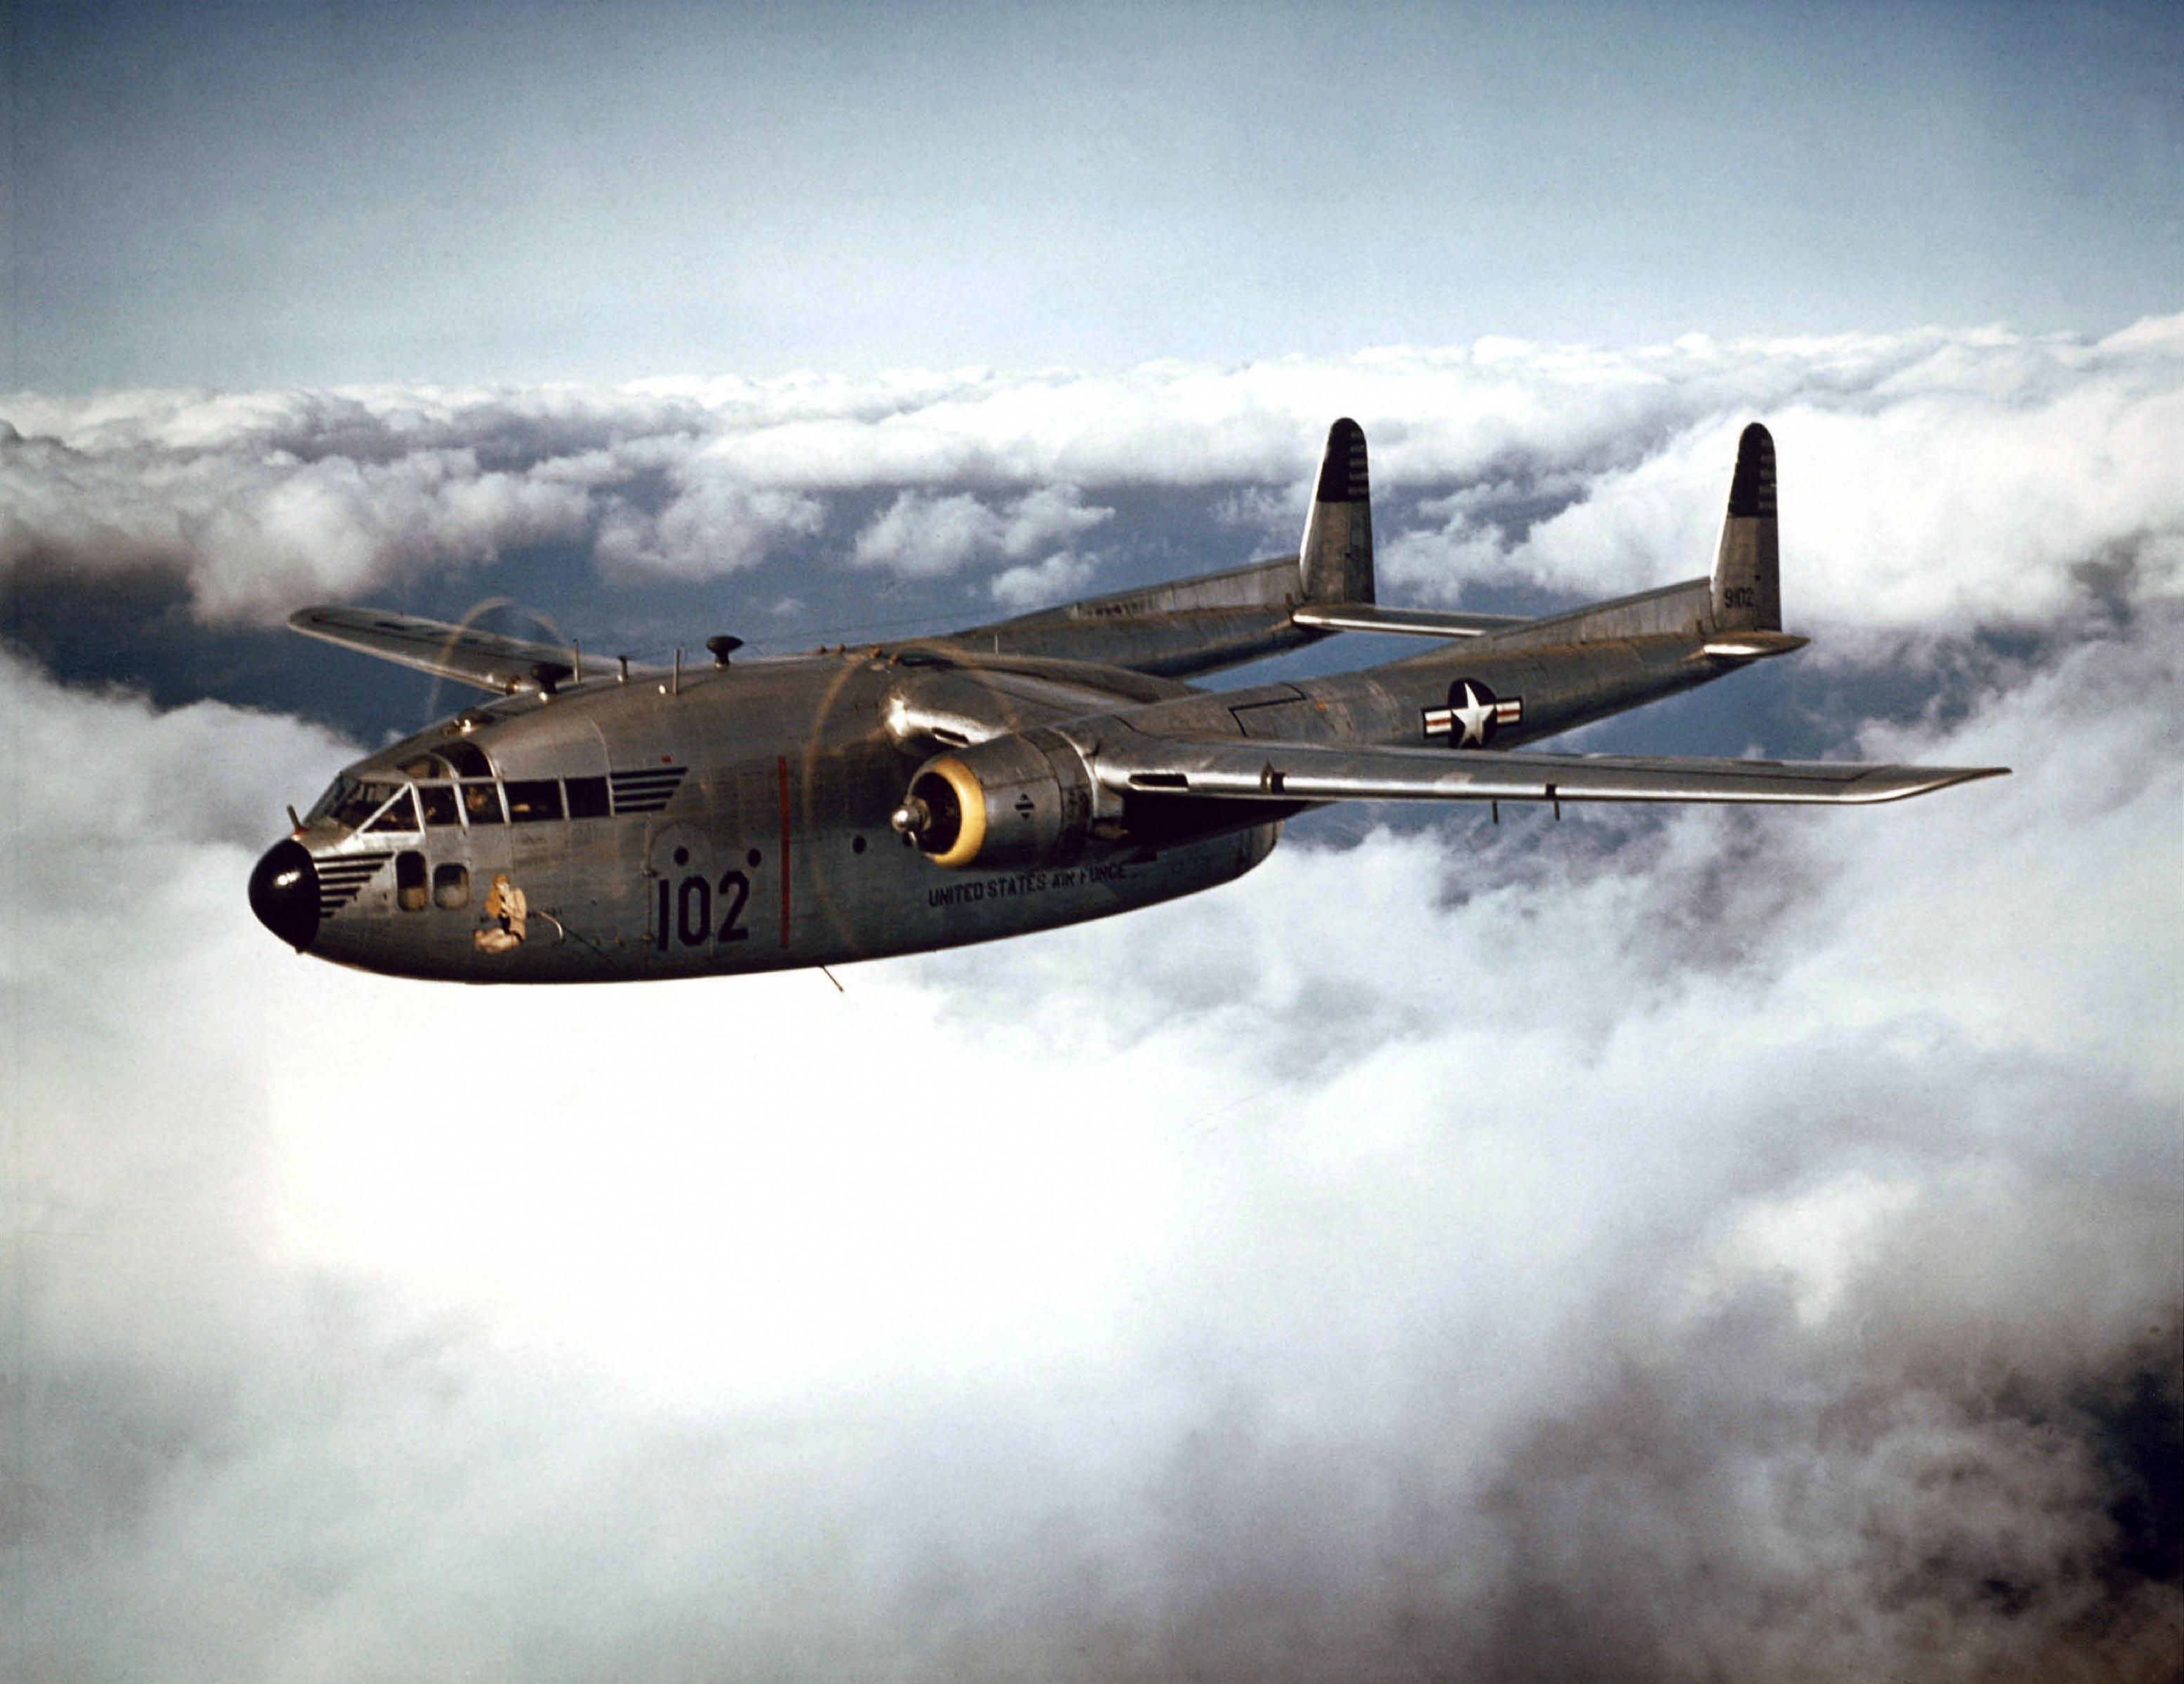 1c8b9feecd7 Aircraft in fiction - Wikipedia